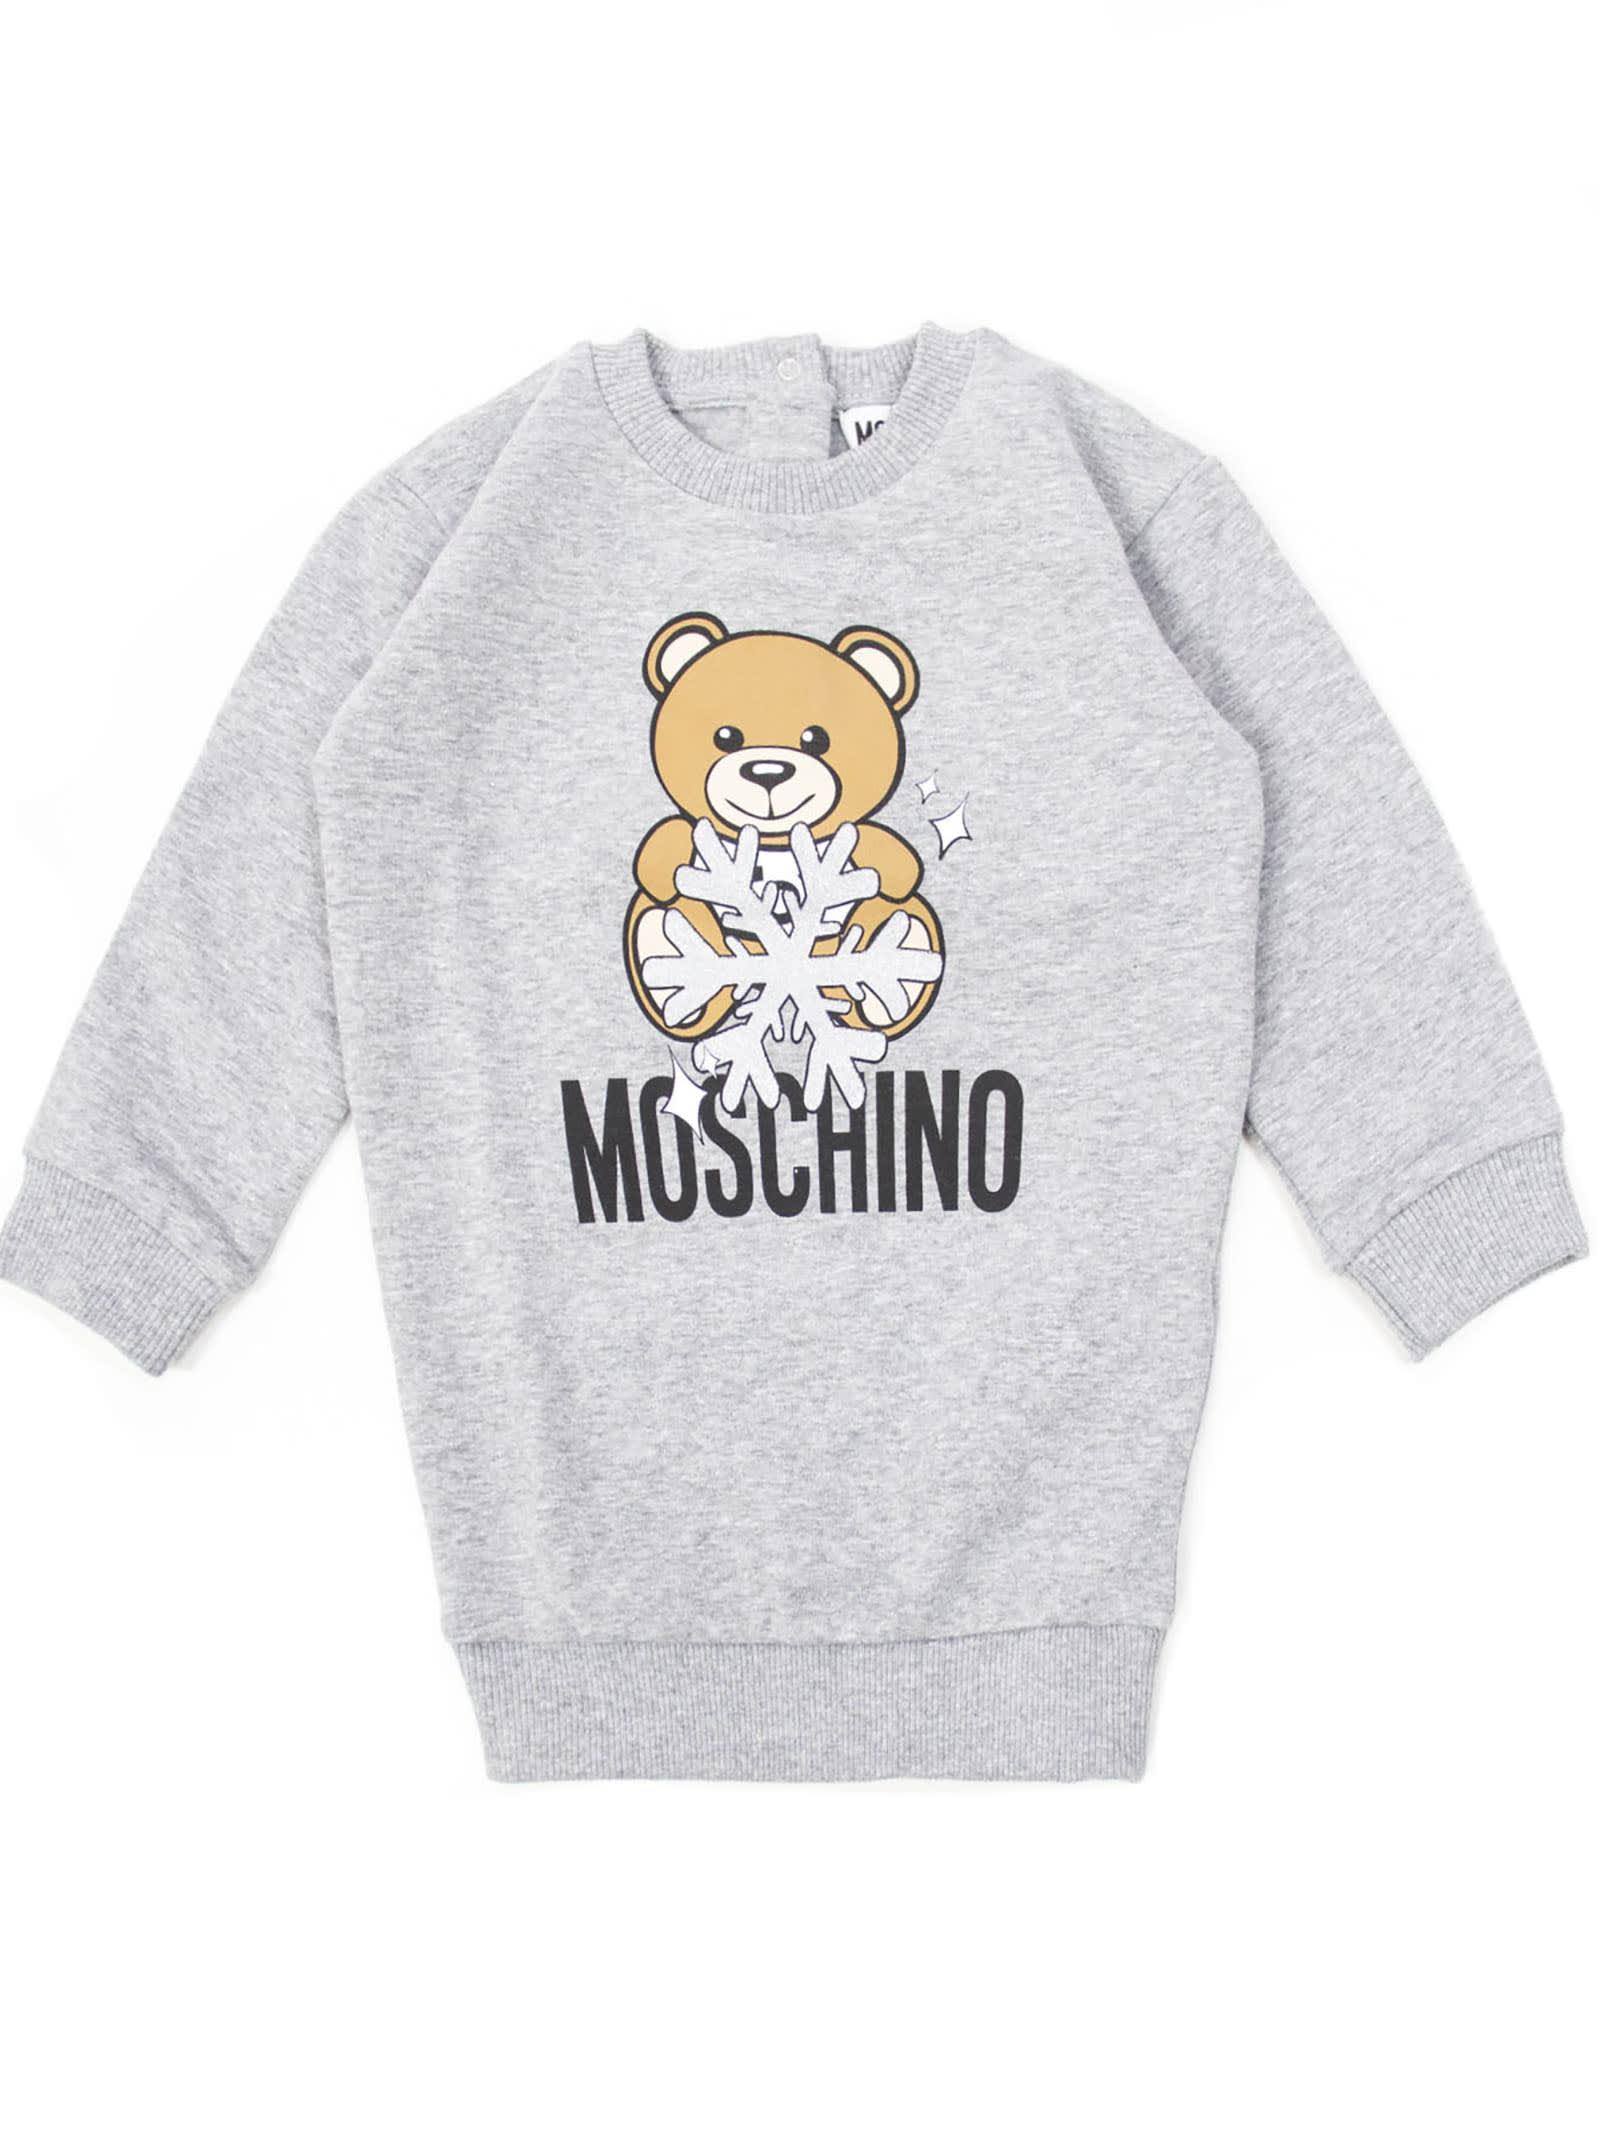 Moschino Grey Cotton Sweatshirt Dress